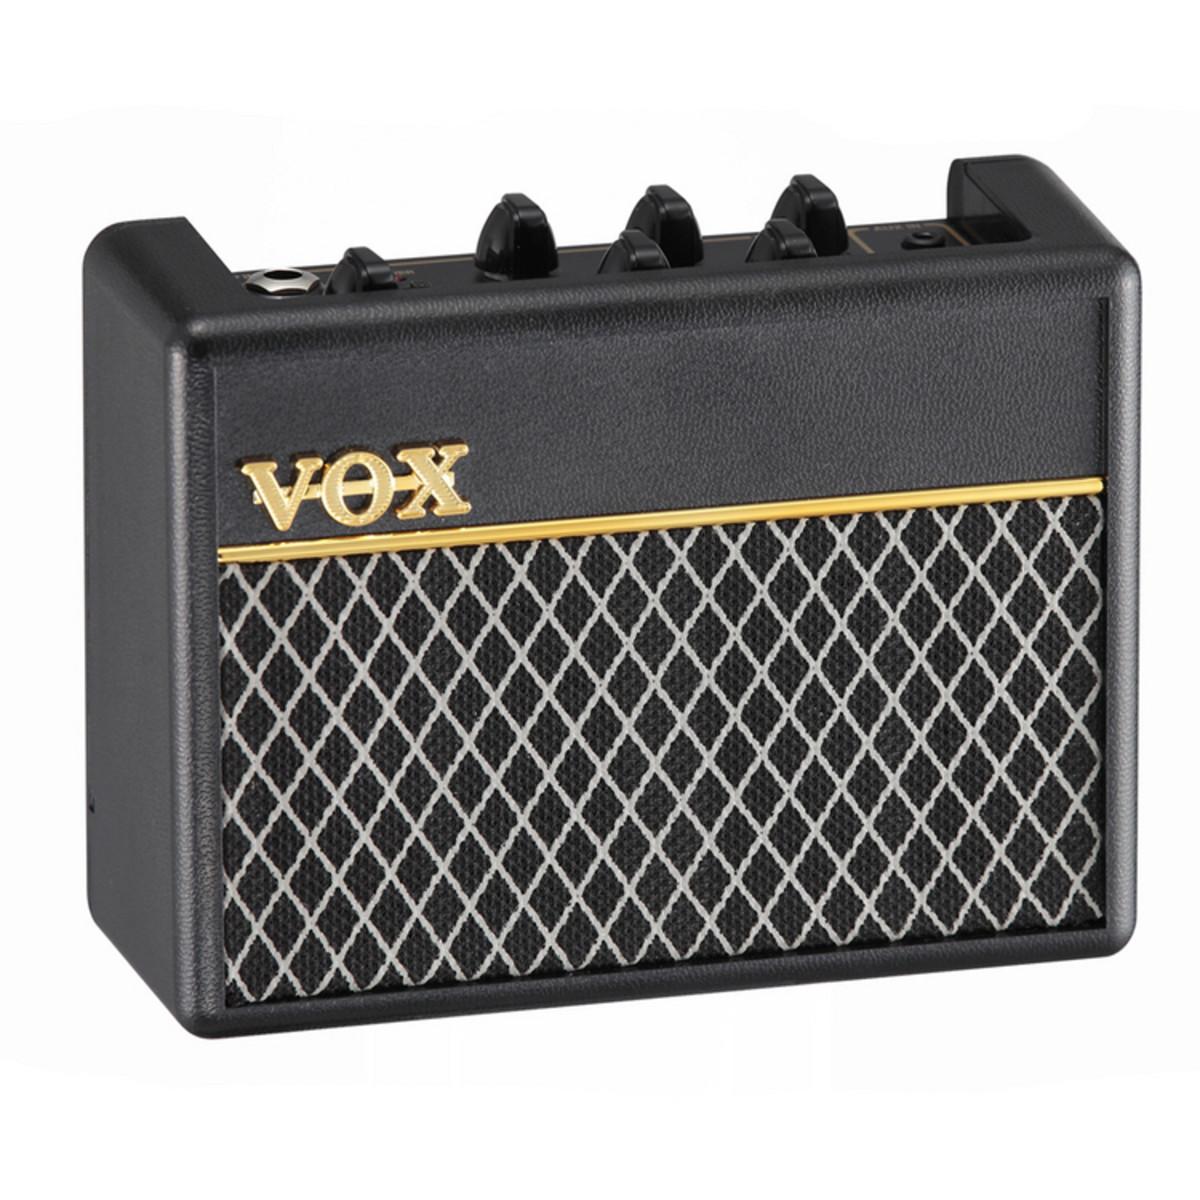 disc vox ac1 rhythmvox bass amplifier at. Black Bedroom Furniture Sets. Home Design Ideas